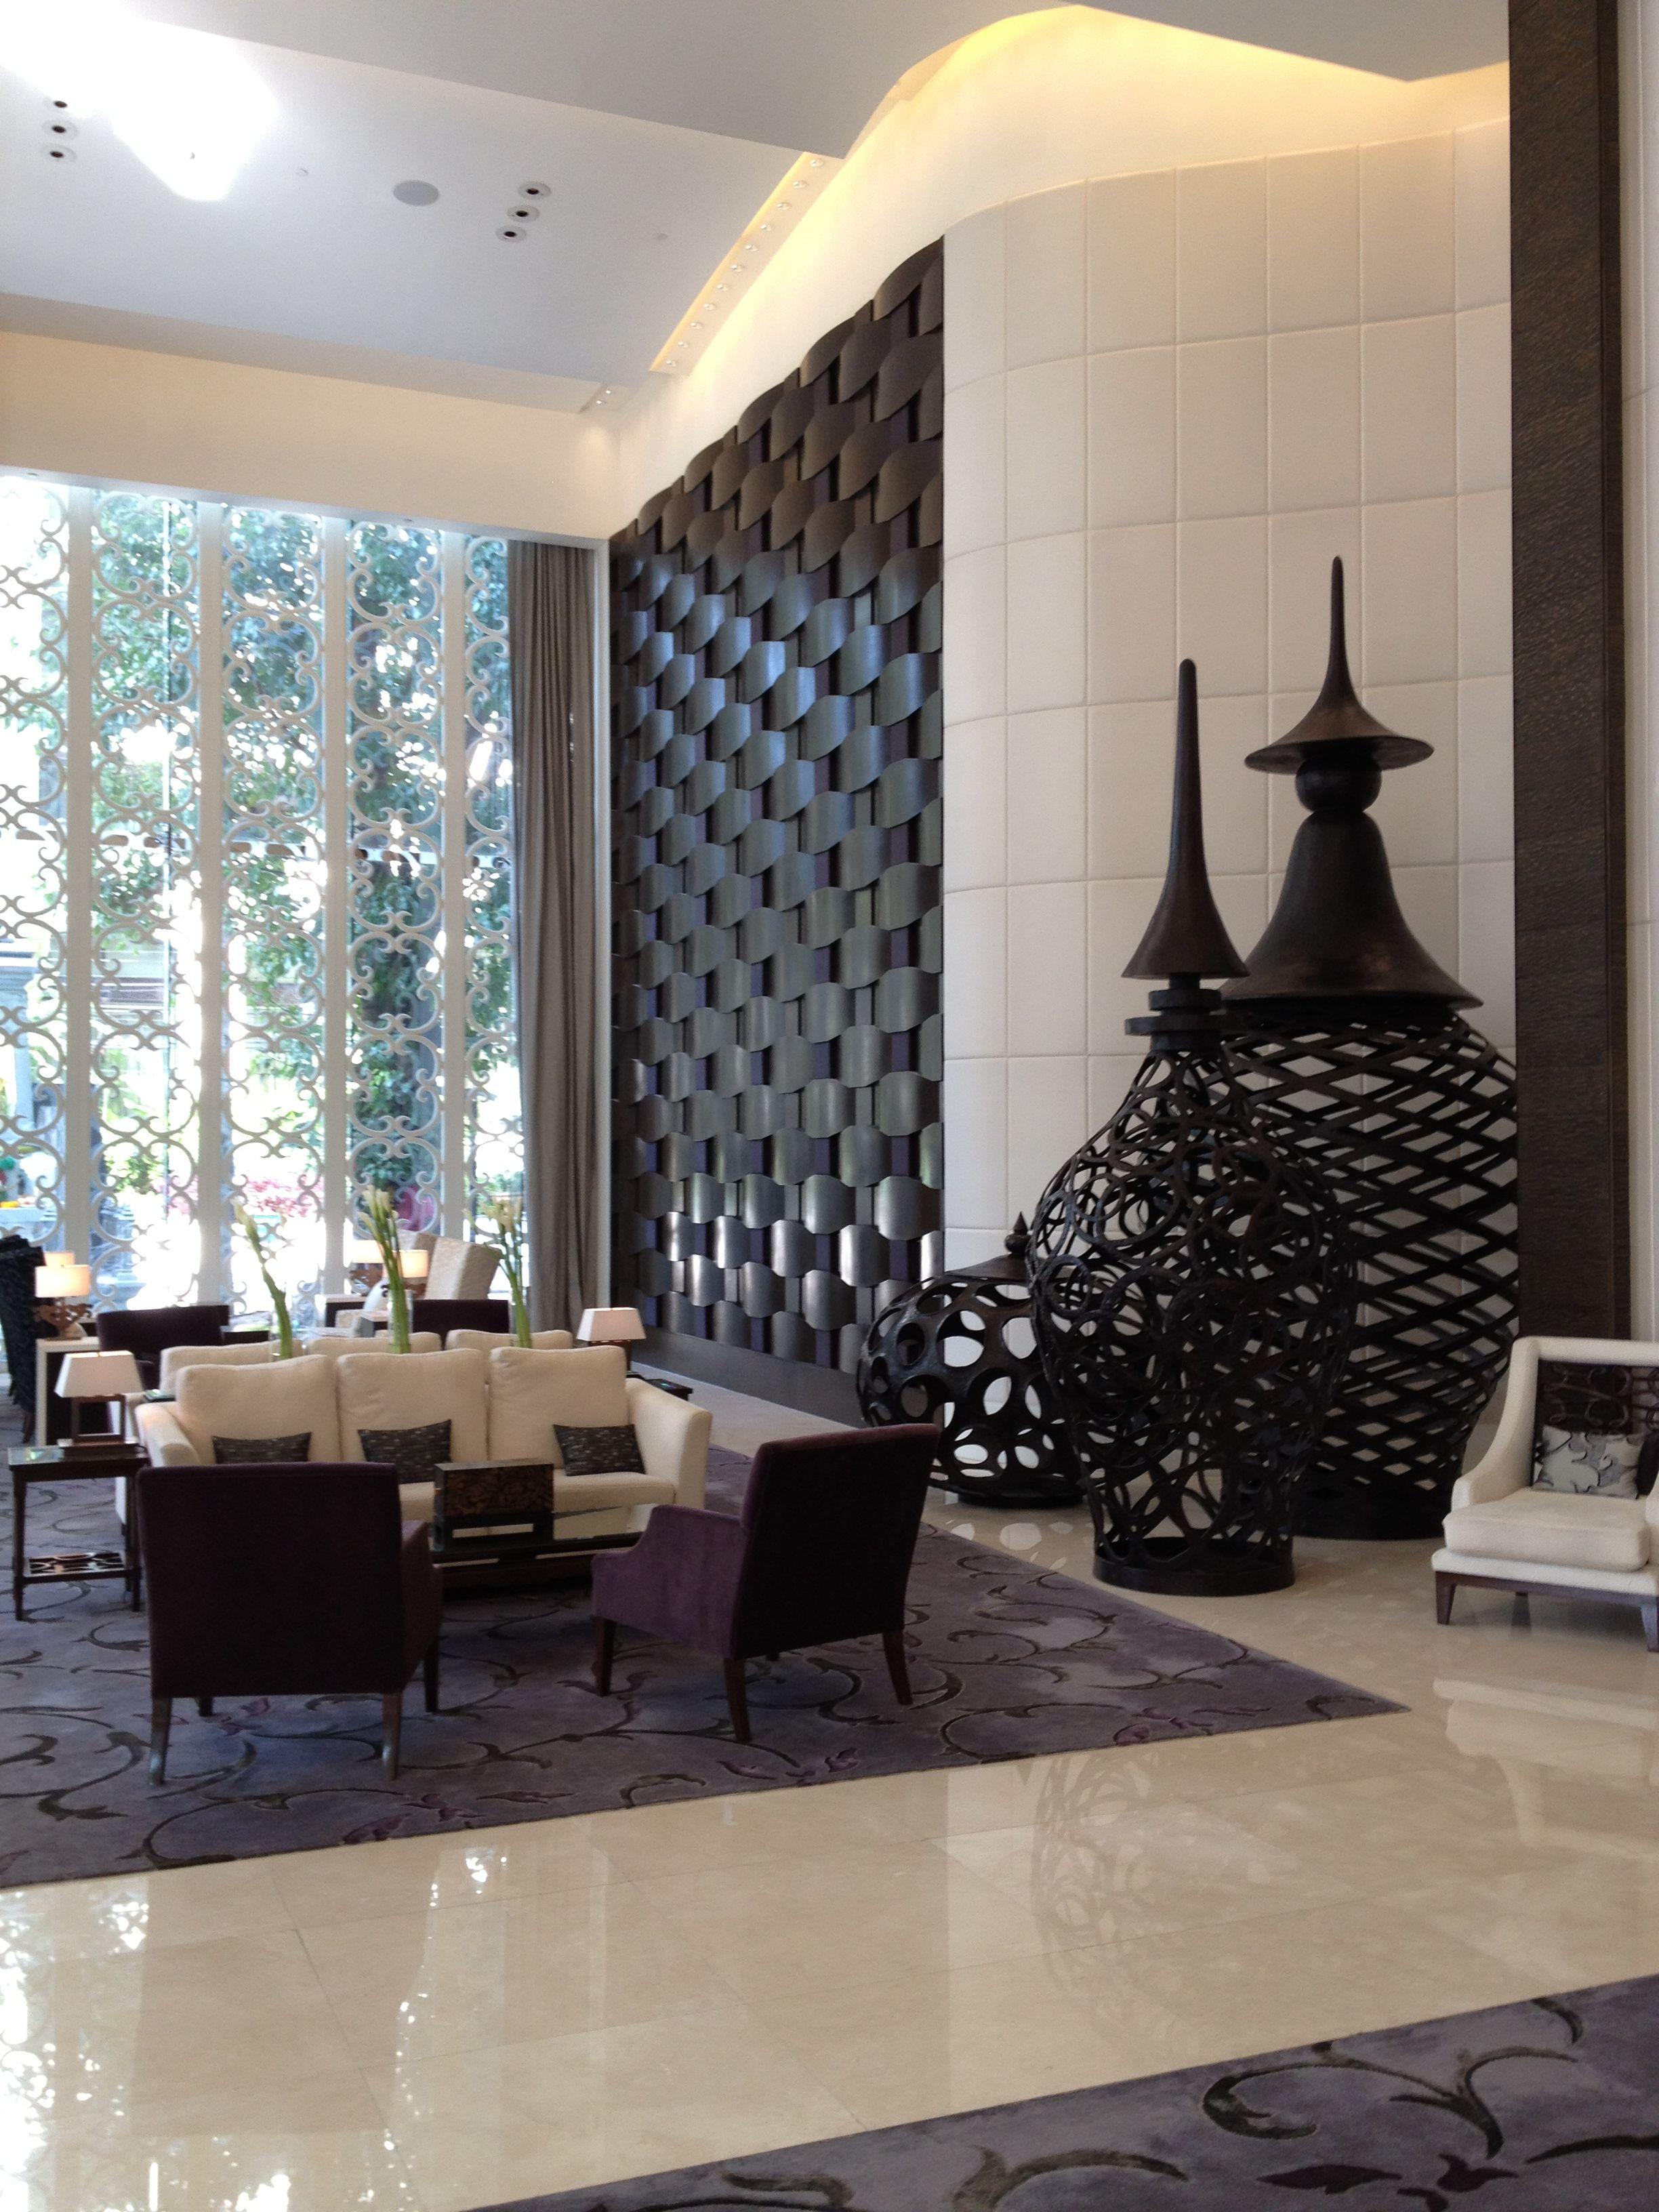 Pin By Vania Natalie On Villa Bali Hotel Interior Design Hotel Interiors Hotel Inspiration